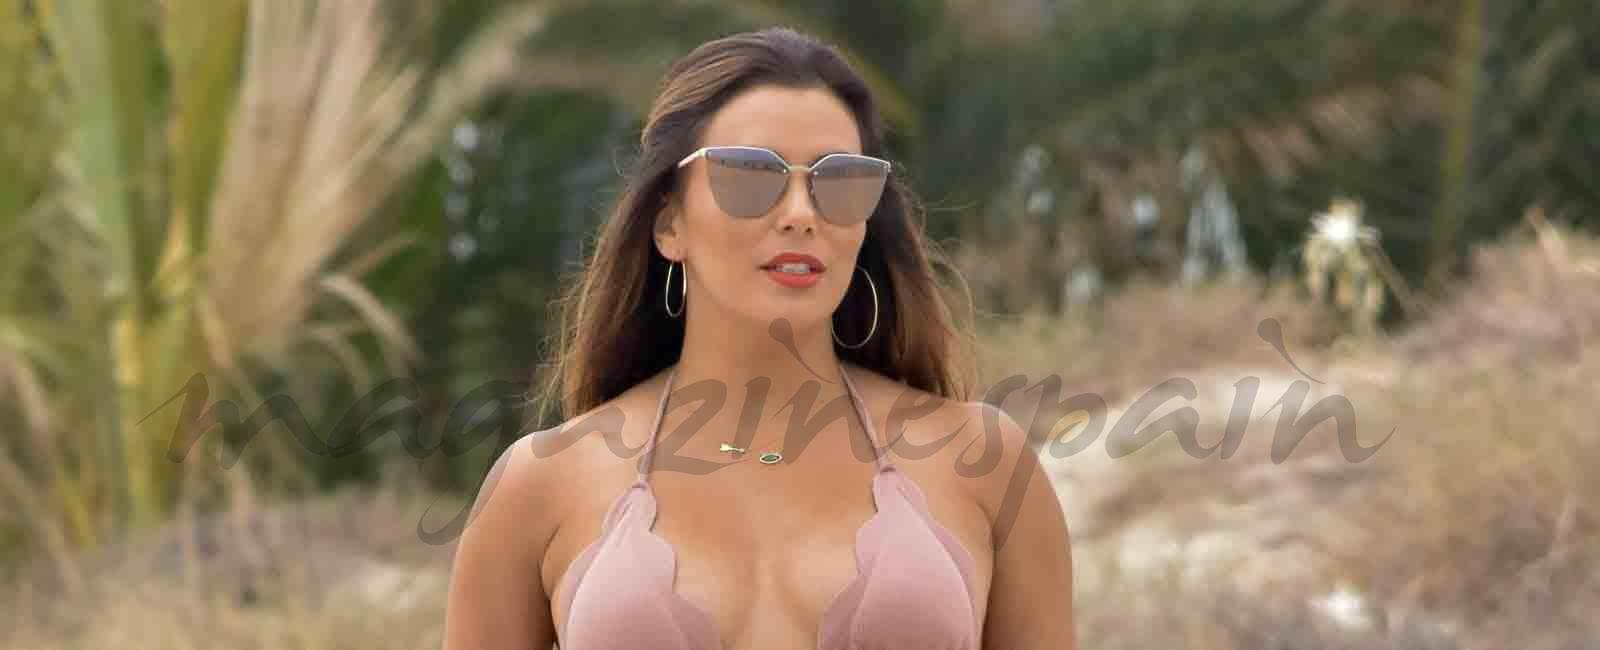 Eva Longoria baja a la playa con flotador